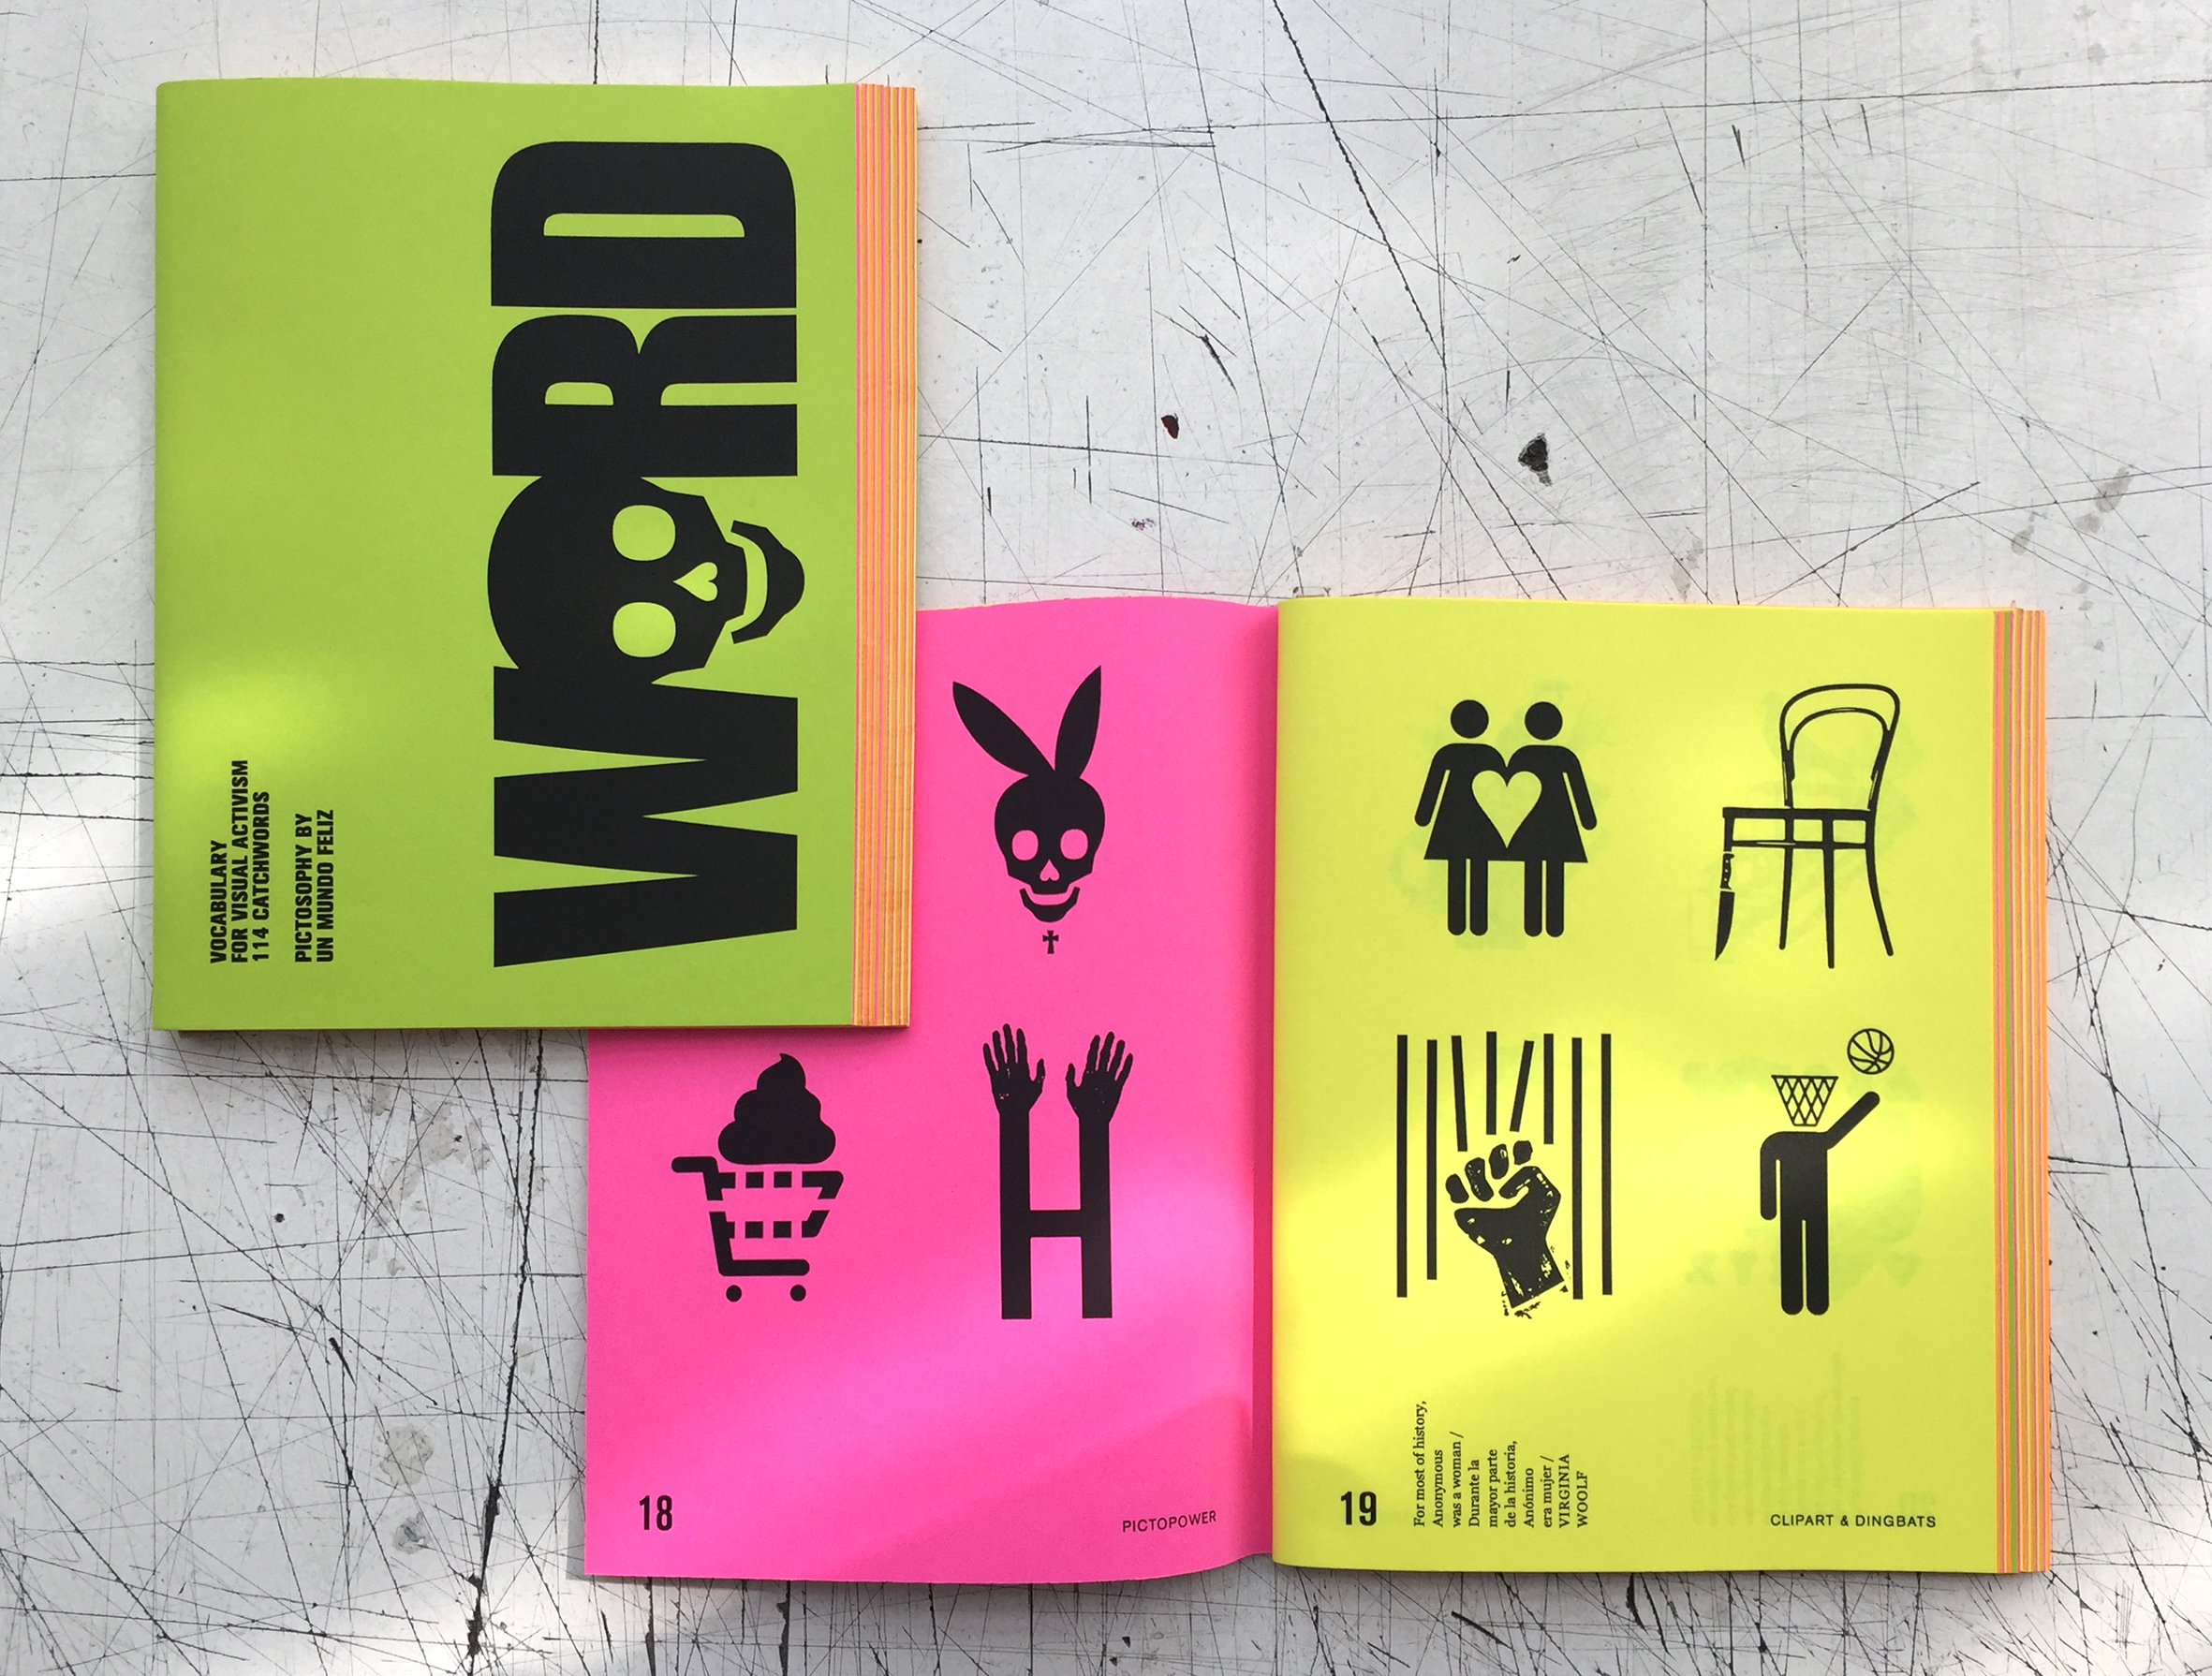 Pictosophy (Picto / Word) by Un Mundo Feliz - Creative Work - $i